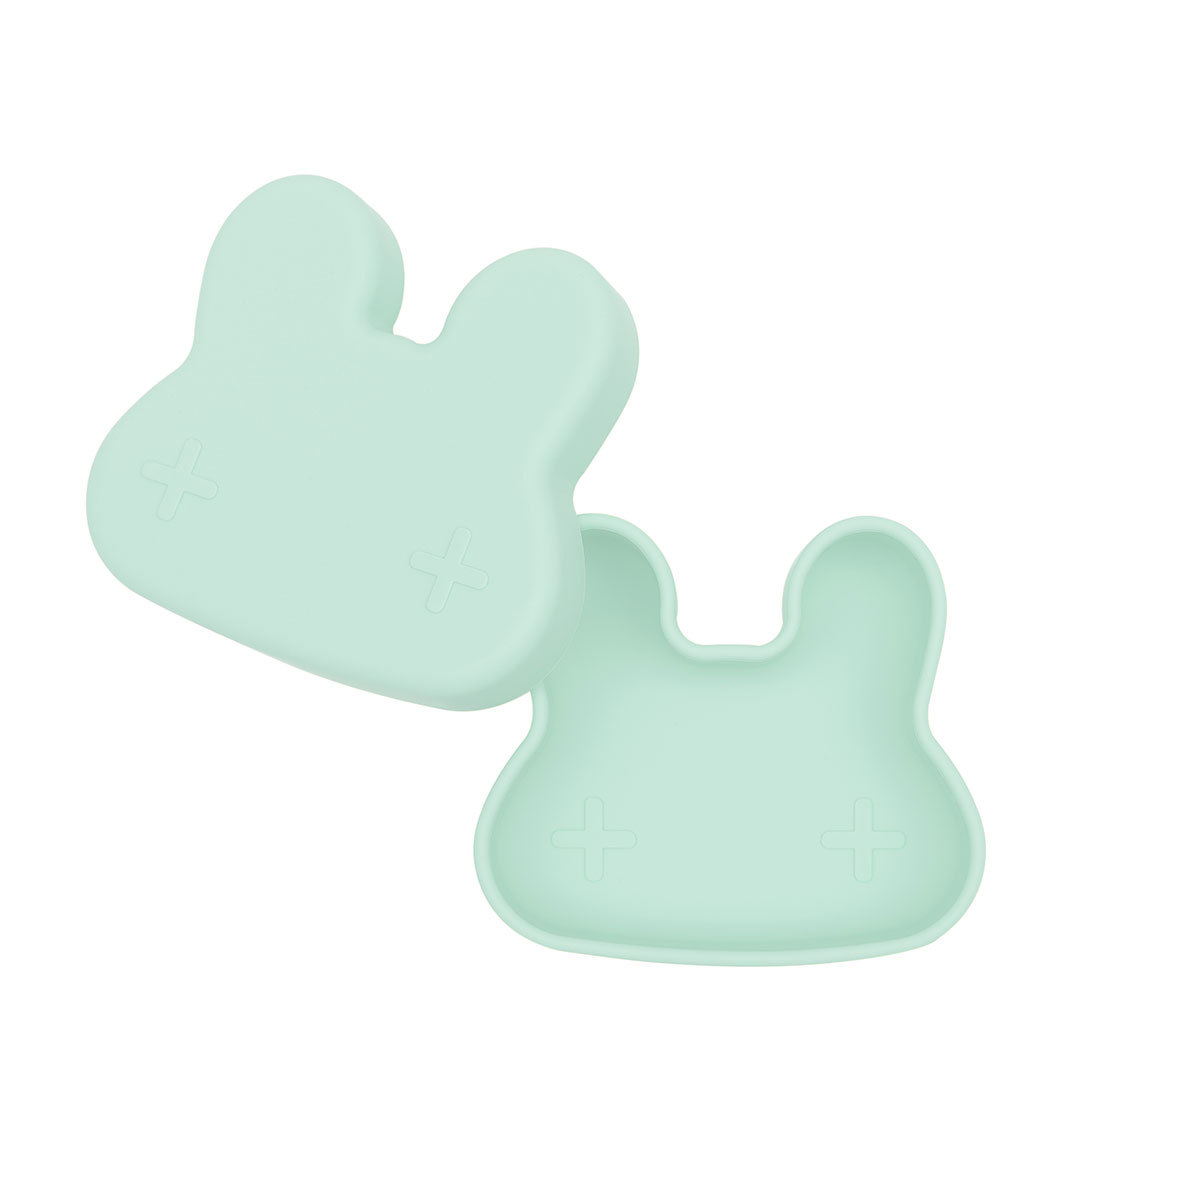 Vaisselle & Couvert Petite Boîte à Goûter Lapin - Minty Green Petite Boîte à Goûter Lapin - Minty Green